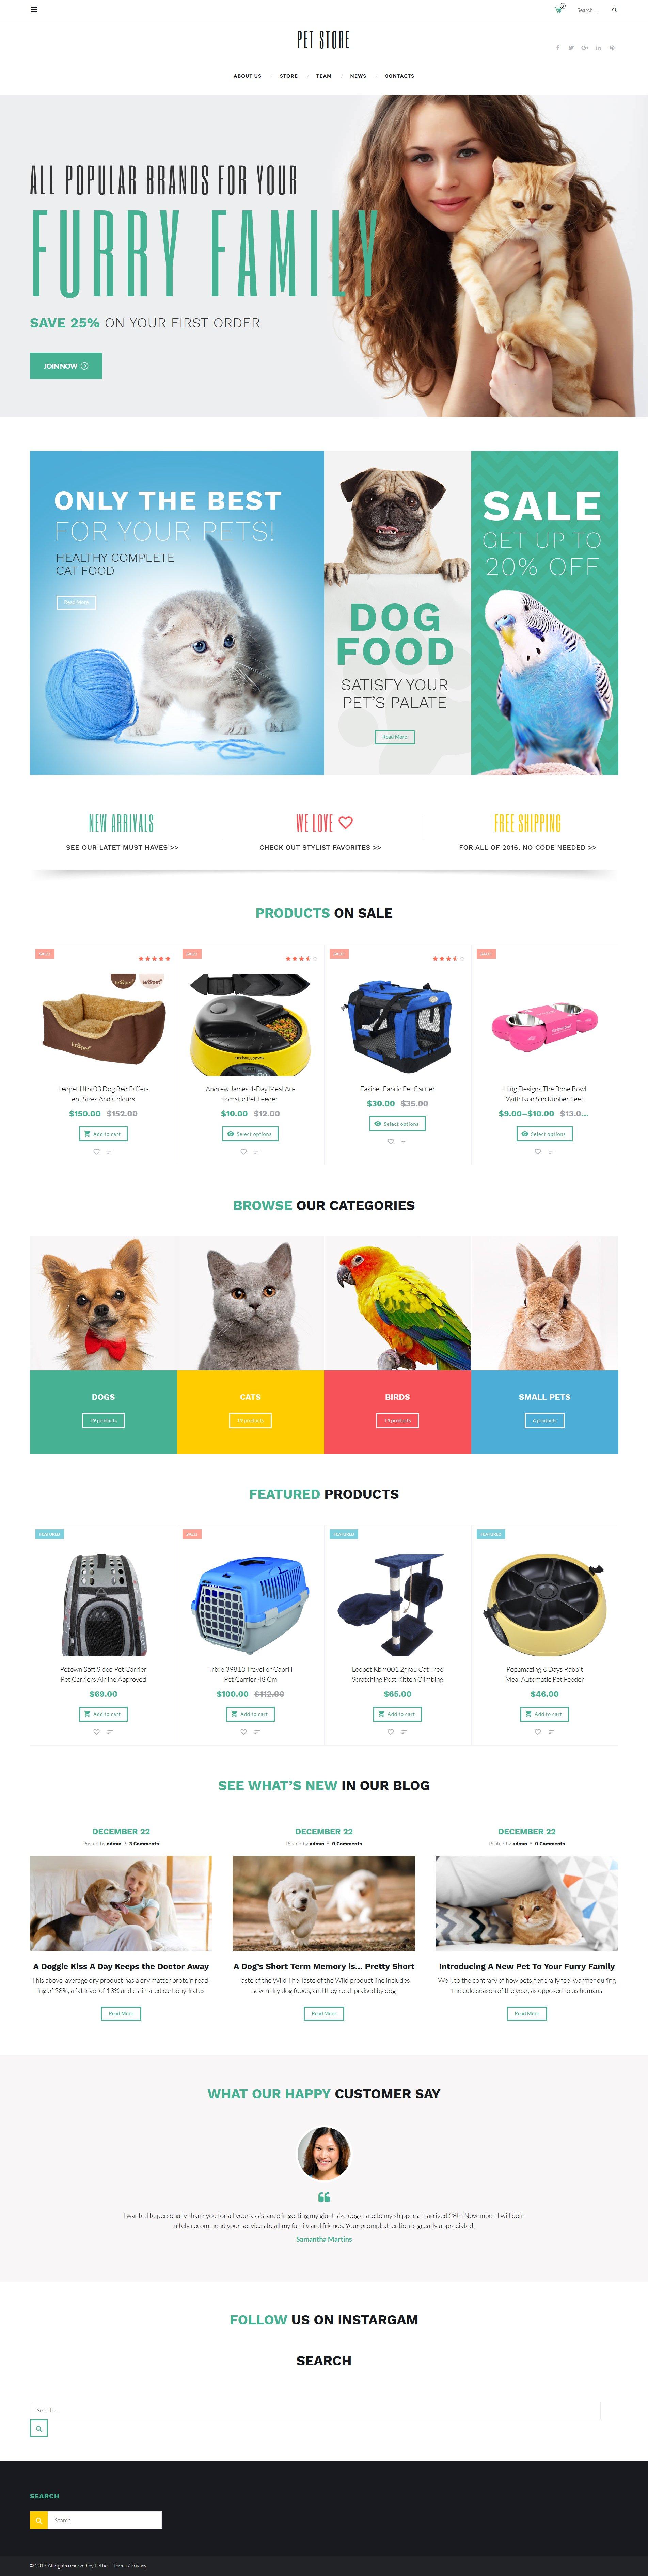 """PetStore - Pets Supplies Shop Responsive WooCommerce Theme"" Responsive WooCommerce Thema №58660 - screenshot"